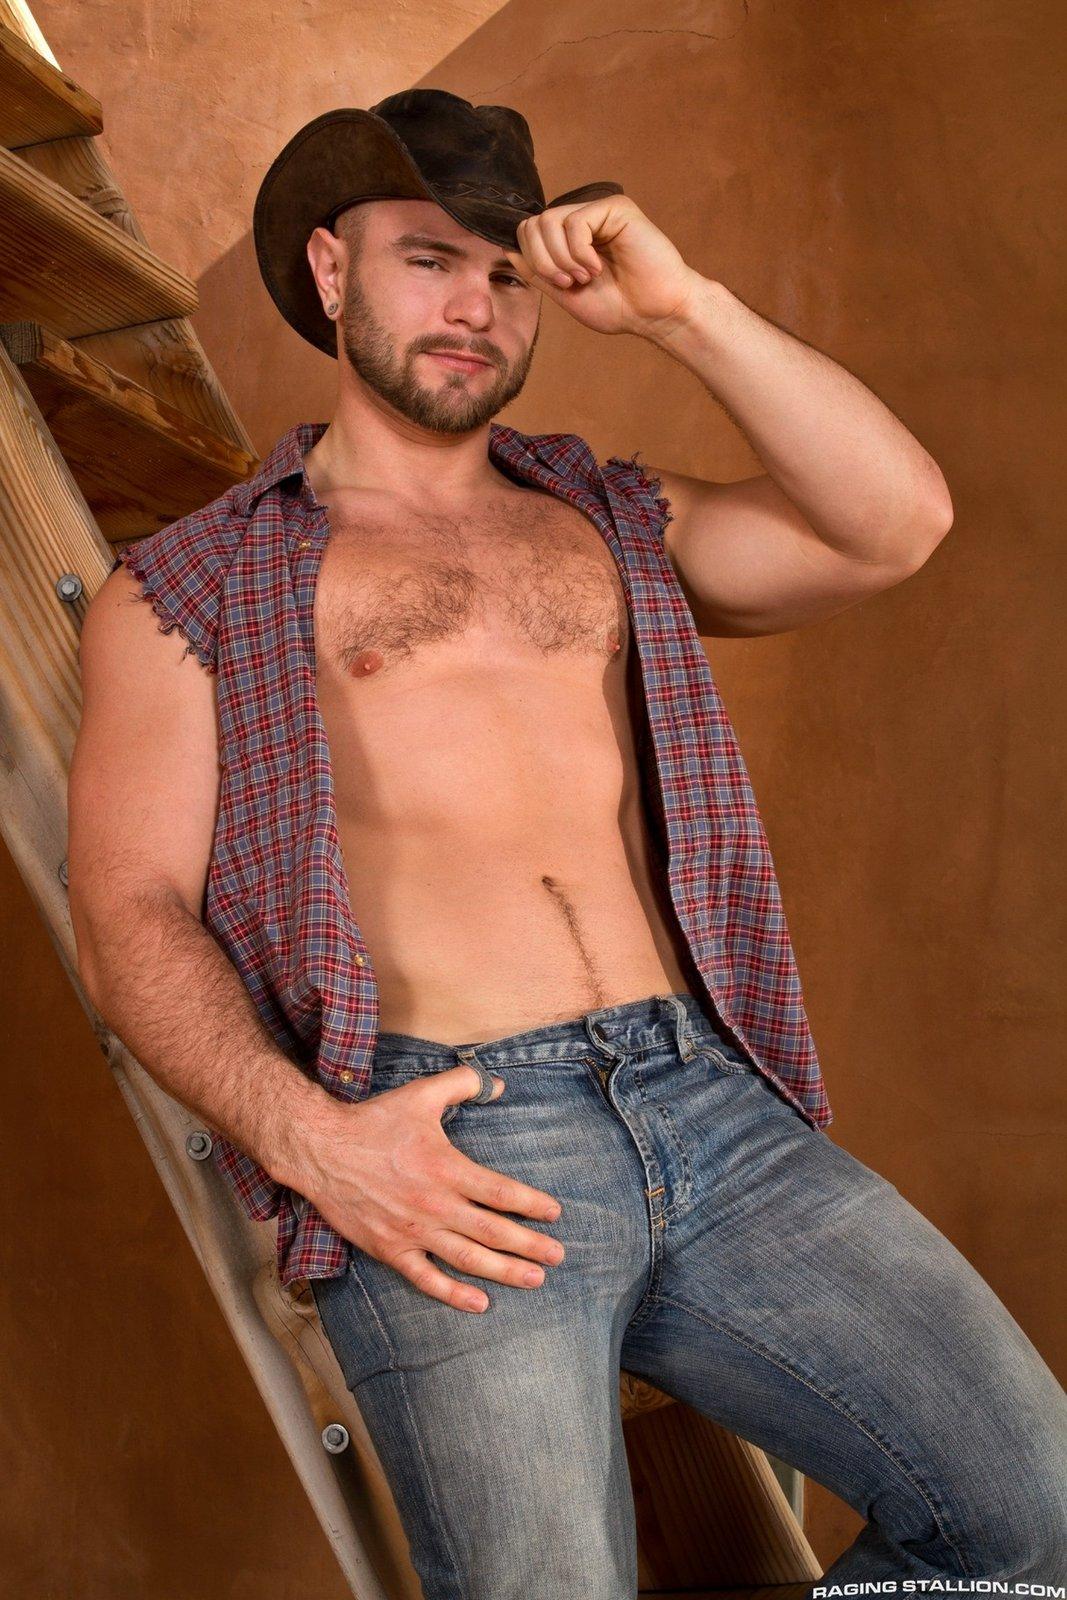 mexican cowboys boy free gay chat single site Enigma